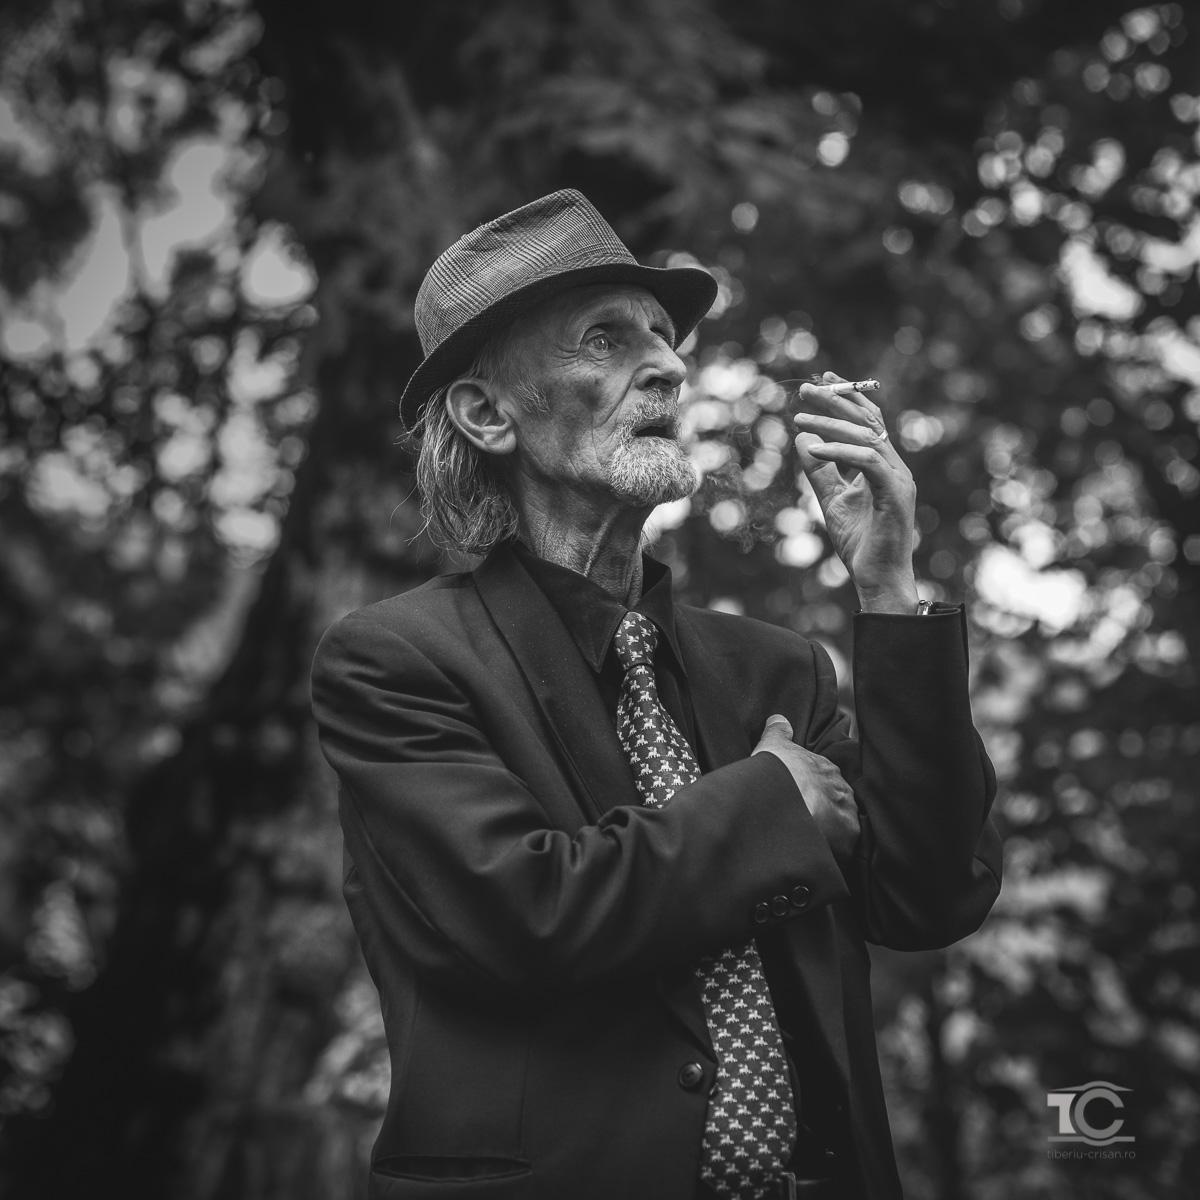 portret parintele alb-negru cu parintele arpi care fumeaza